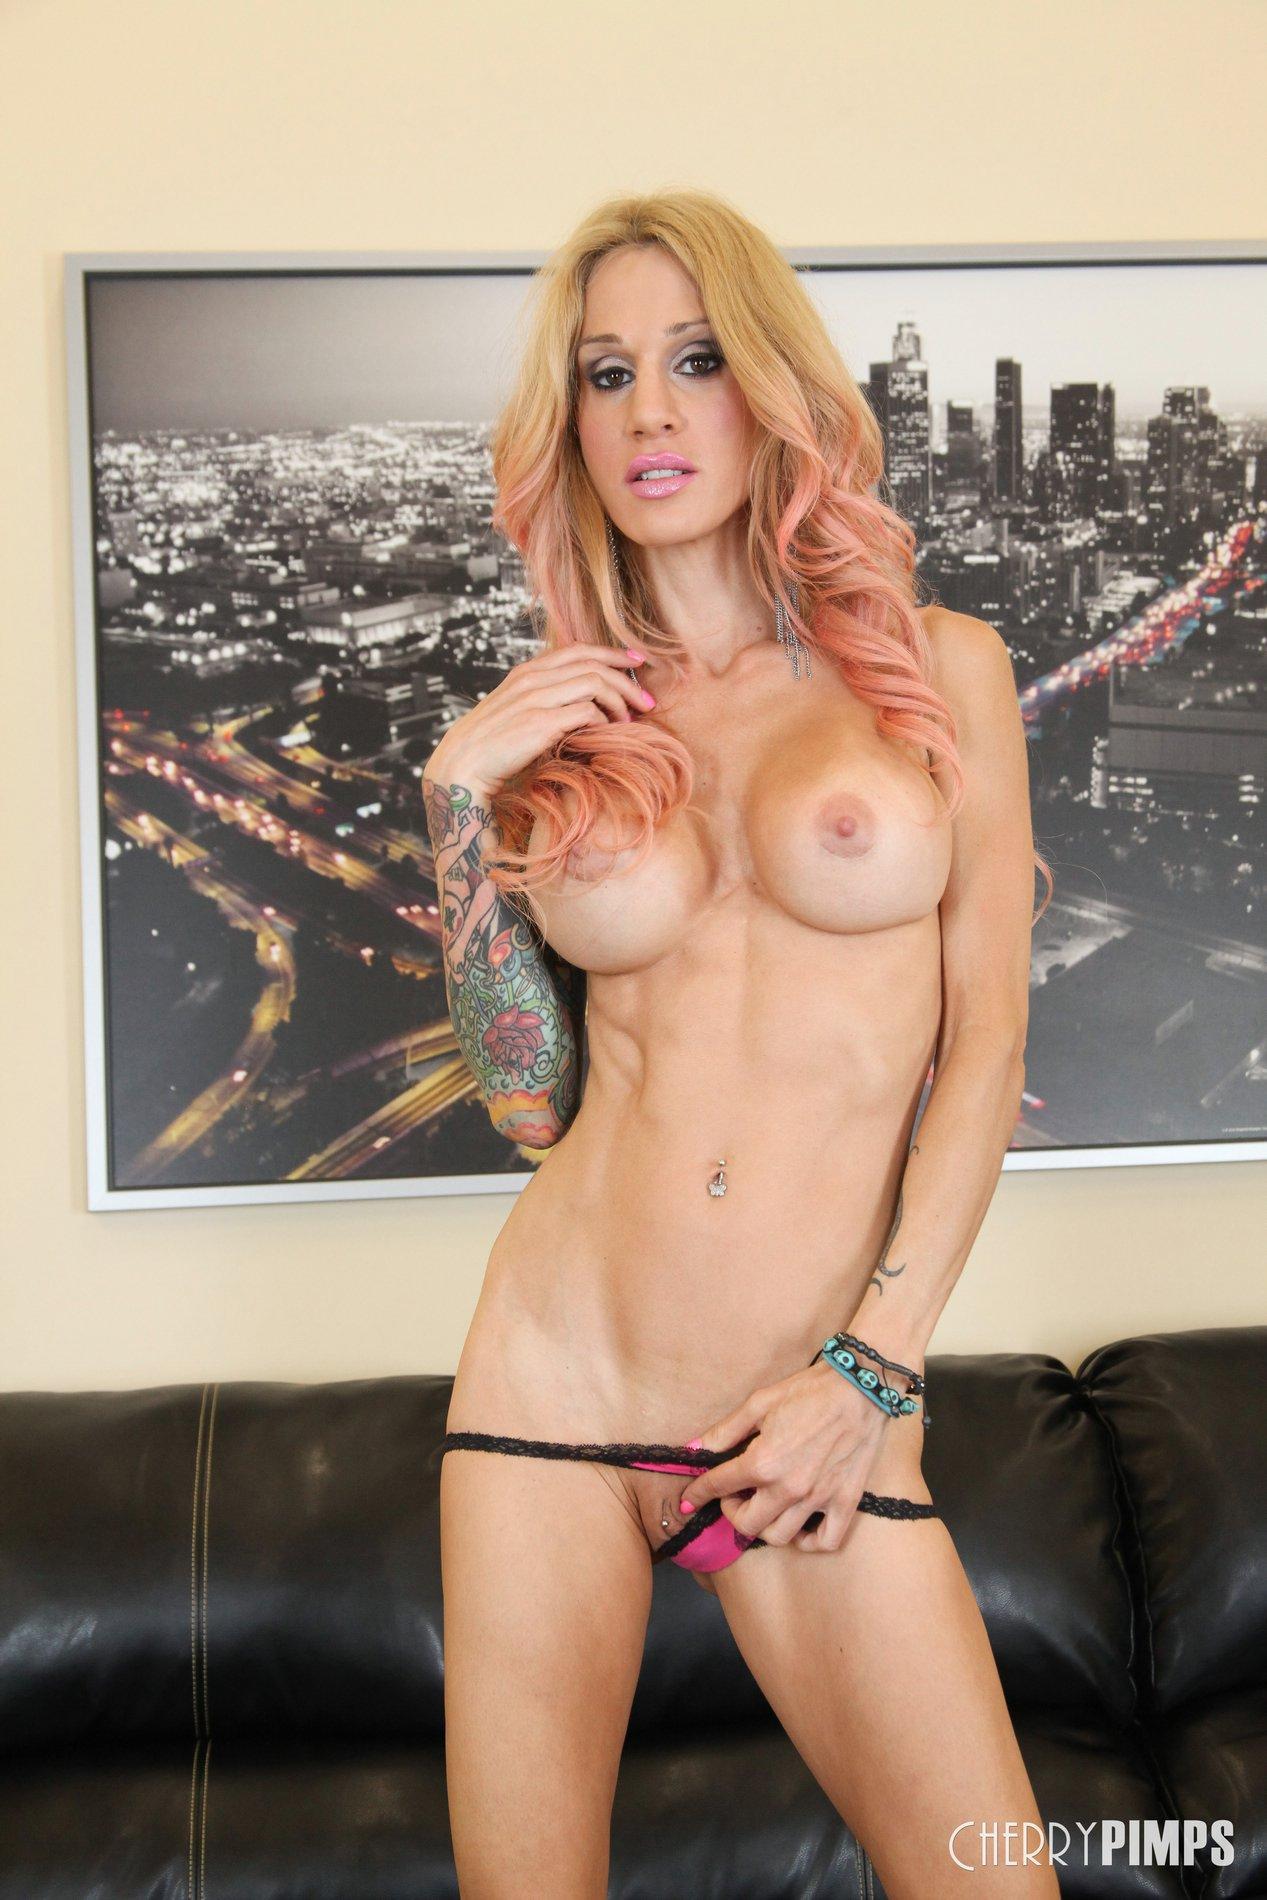 Sarah jessie hot body ink 1